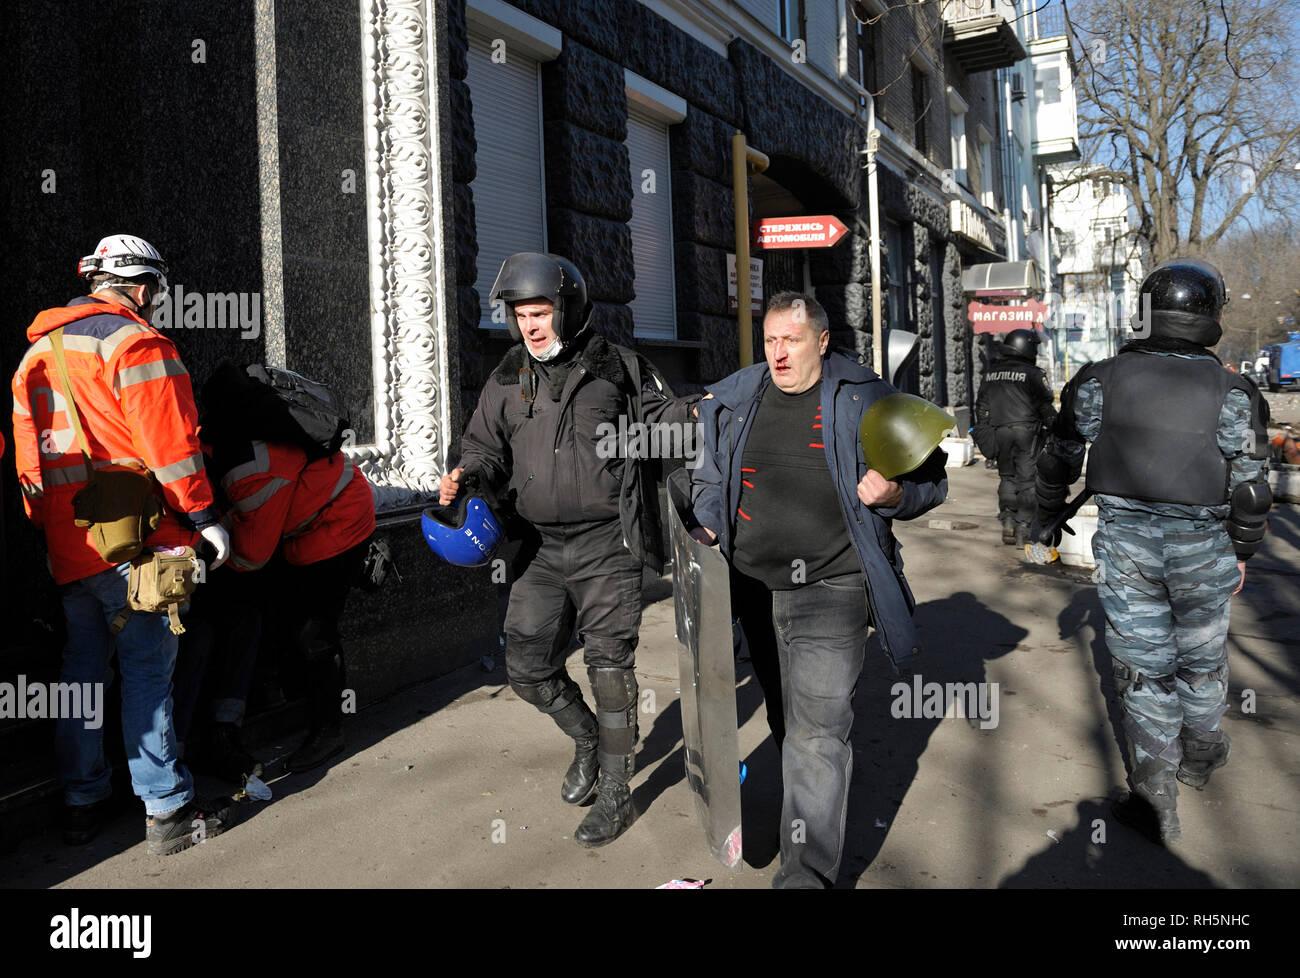 Policeman (Berkut unit) leading protester arrested. Street clashes on Institutskaya street. Revolution of Dignity. February 18, 2014. Kiev, Ukraine - Stock Image